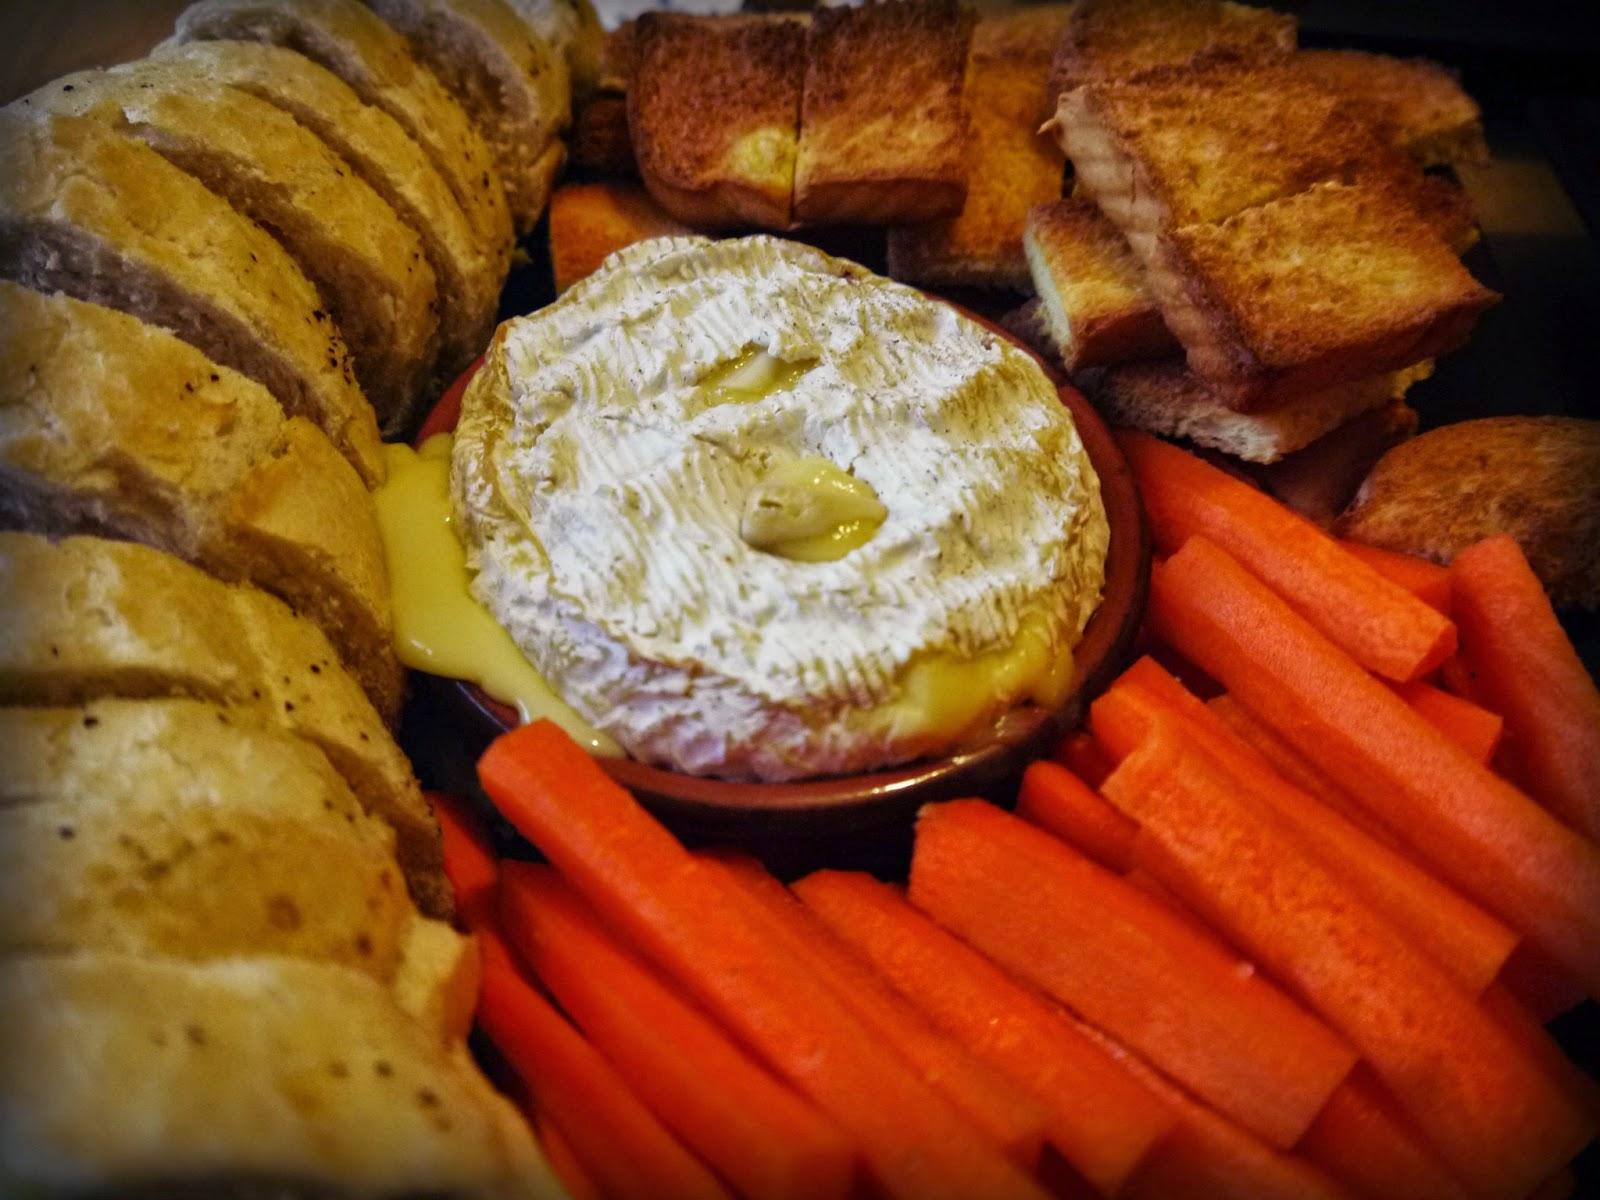 French, brioche, feast